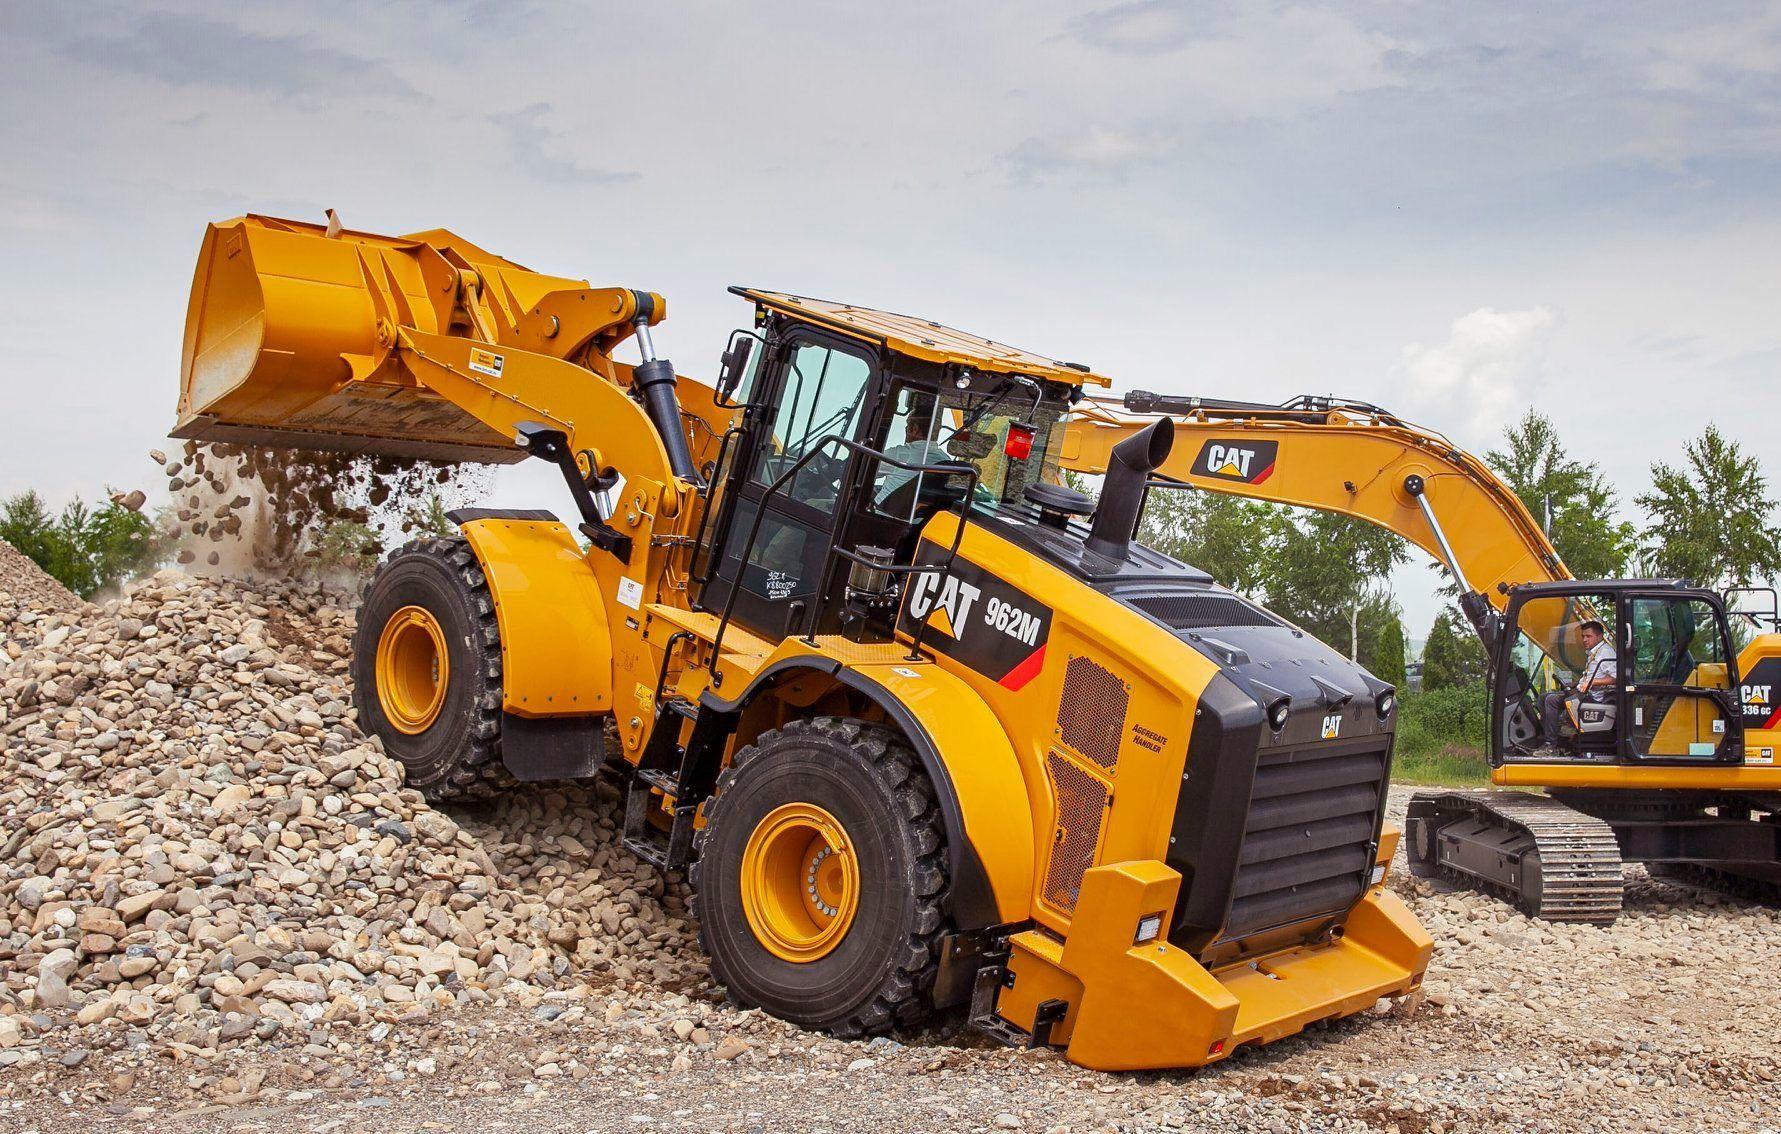 Cat wheel loader Mining equipment, Tractors, Vehicles